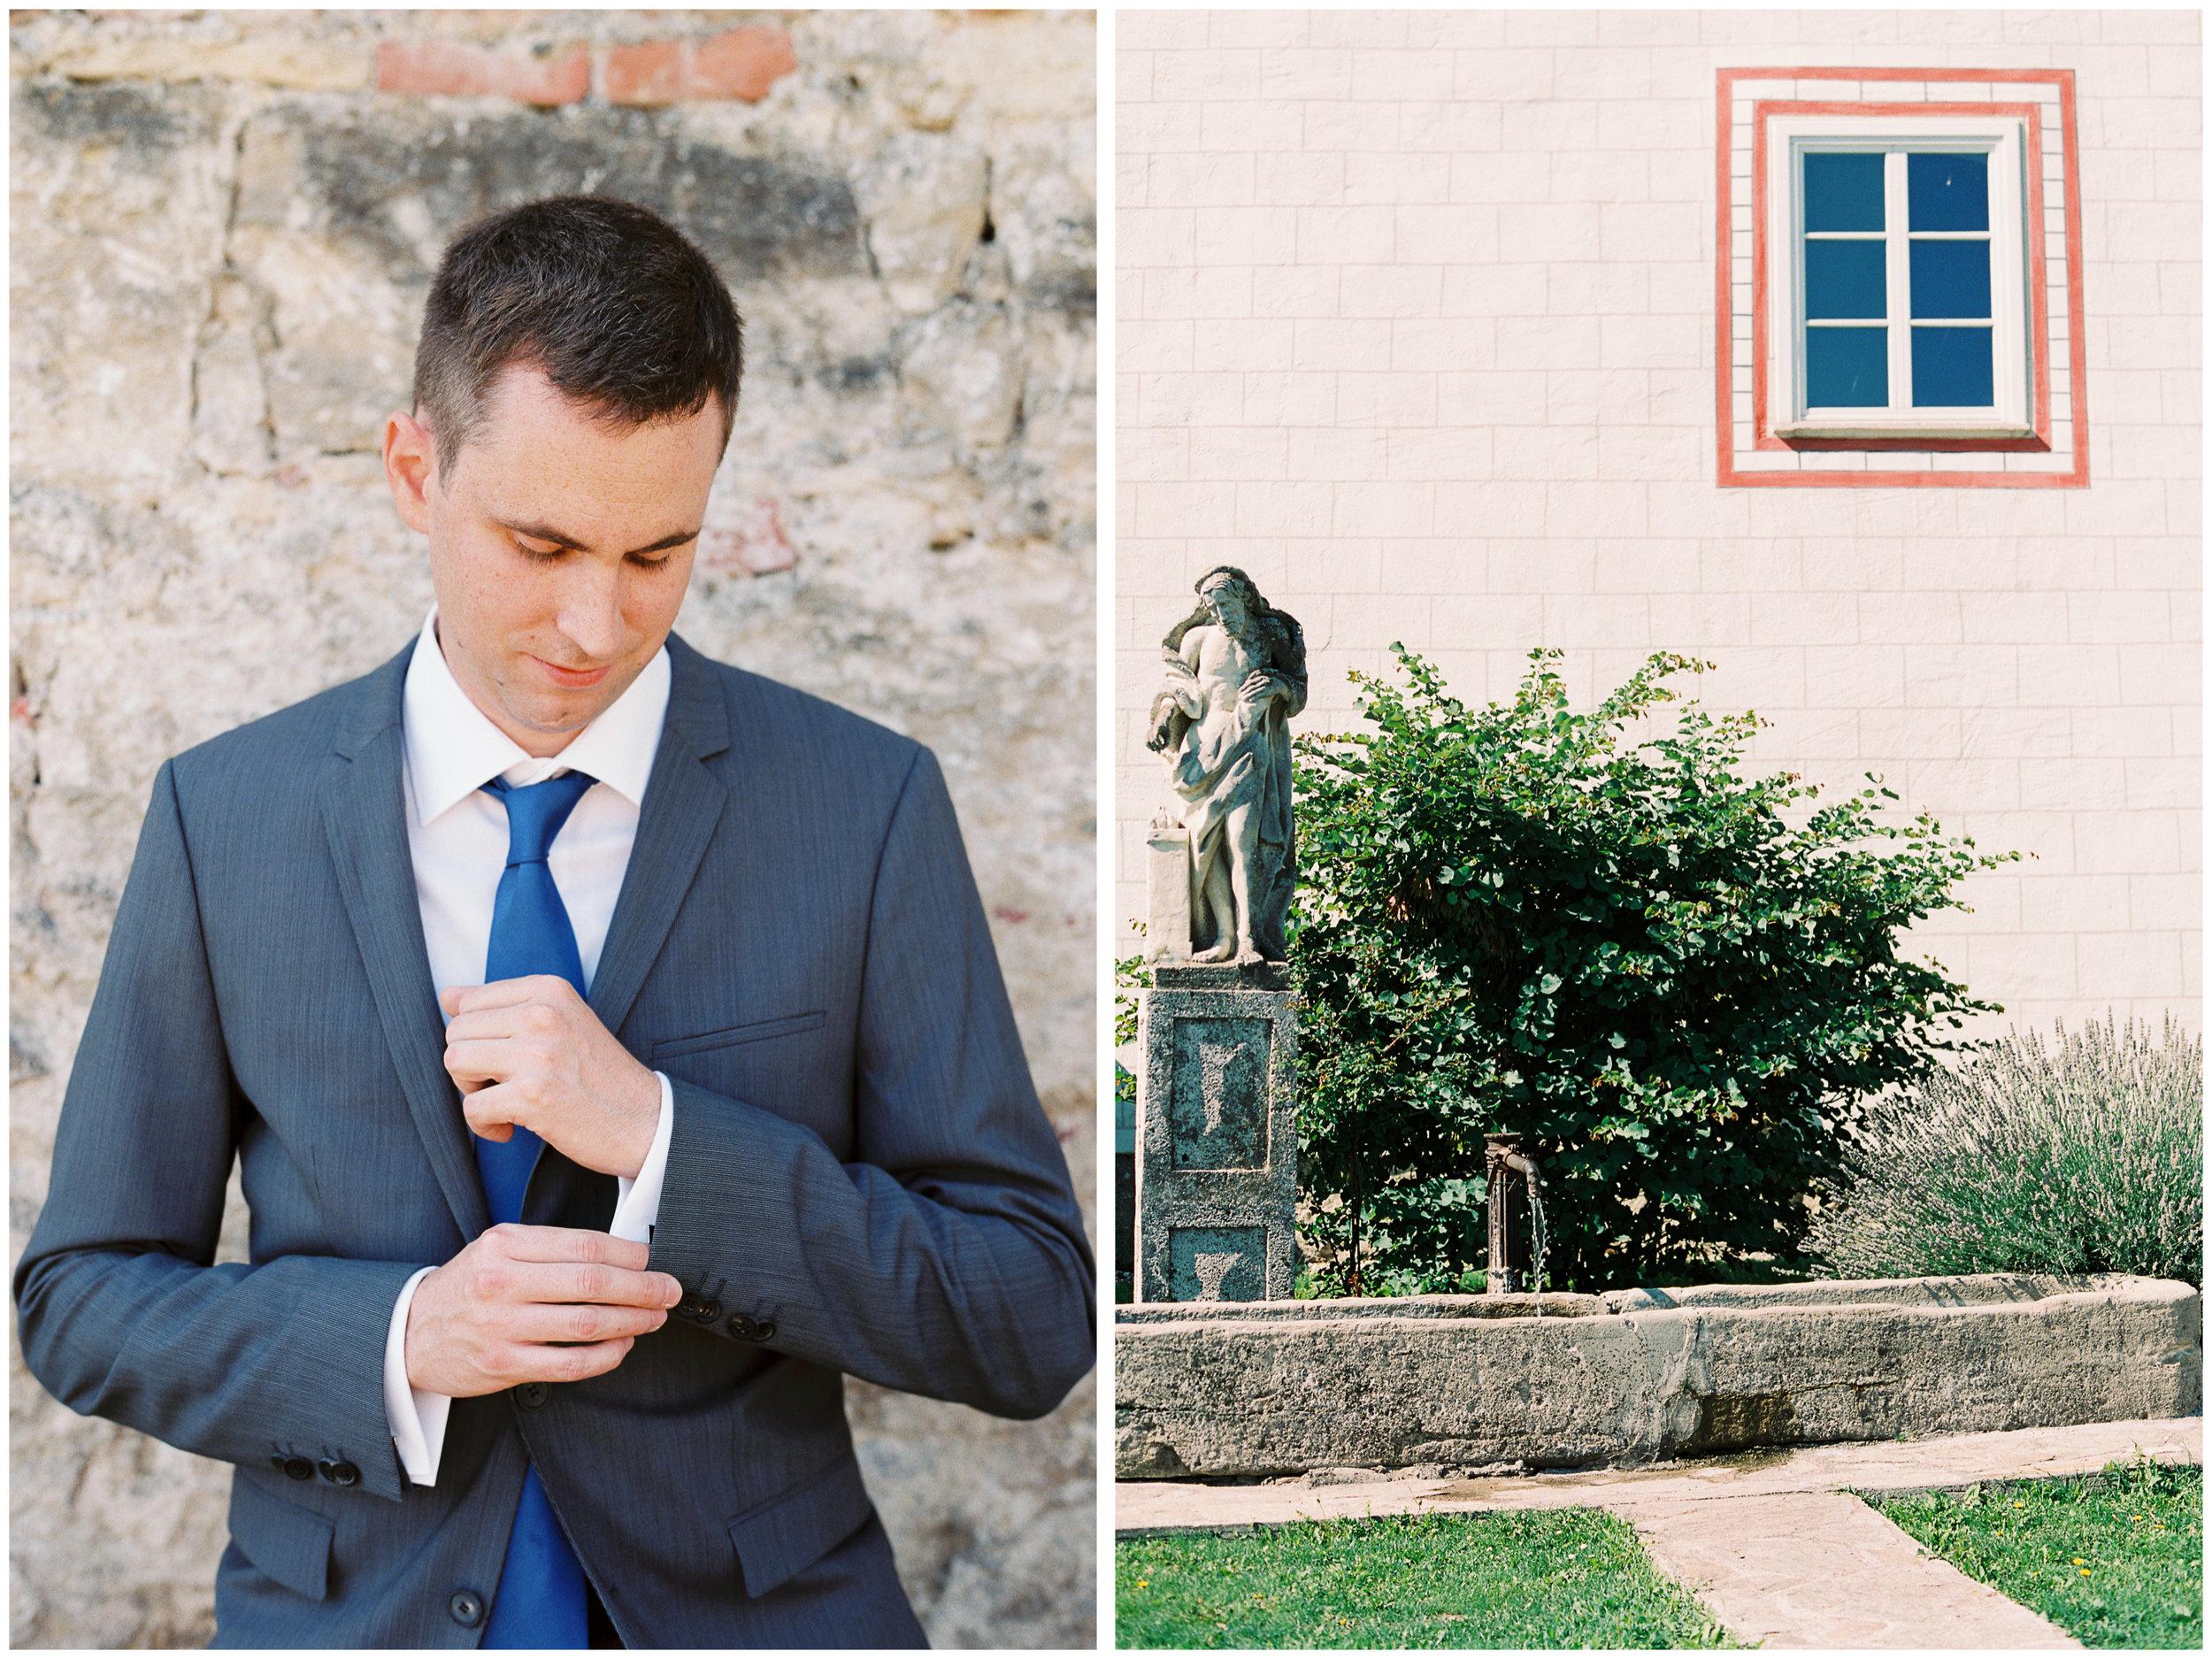 Austria Wedding | Thallern, Austria | Michelle Mock Photography | Vienna Wedding Photographer | Austrian Film Photographer | Contax 645 | Fuji400H